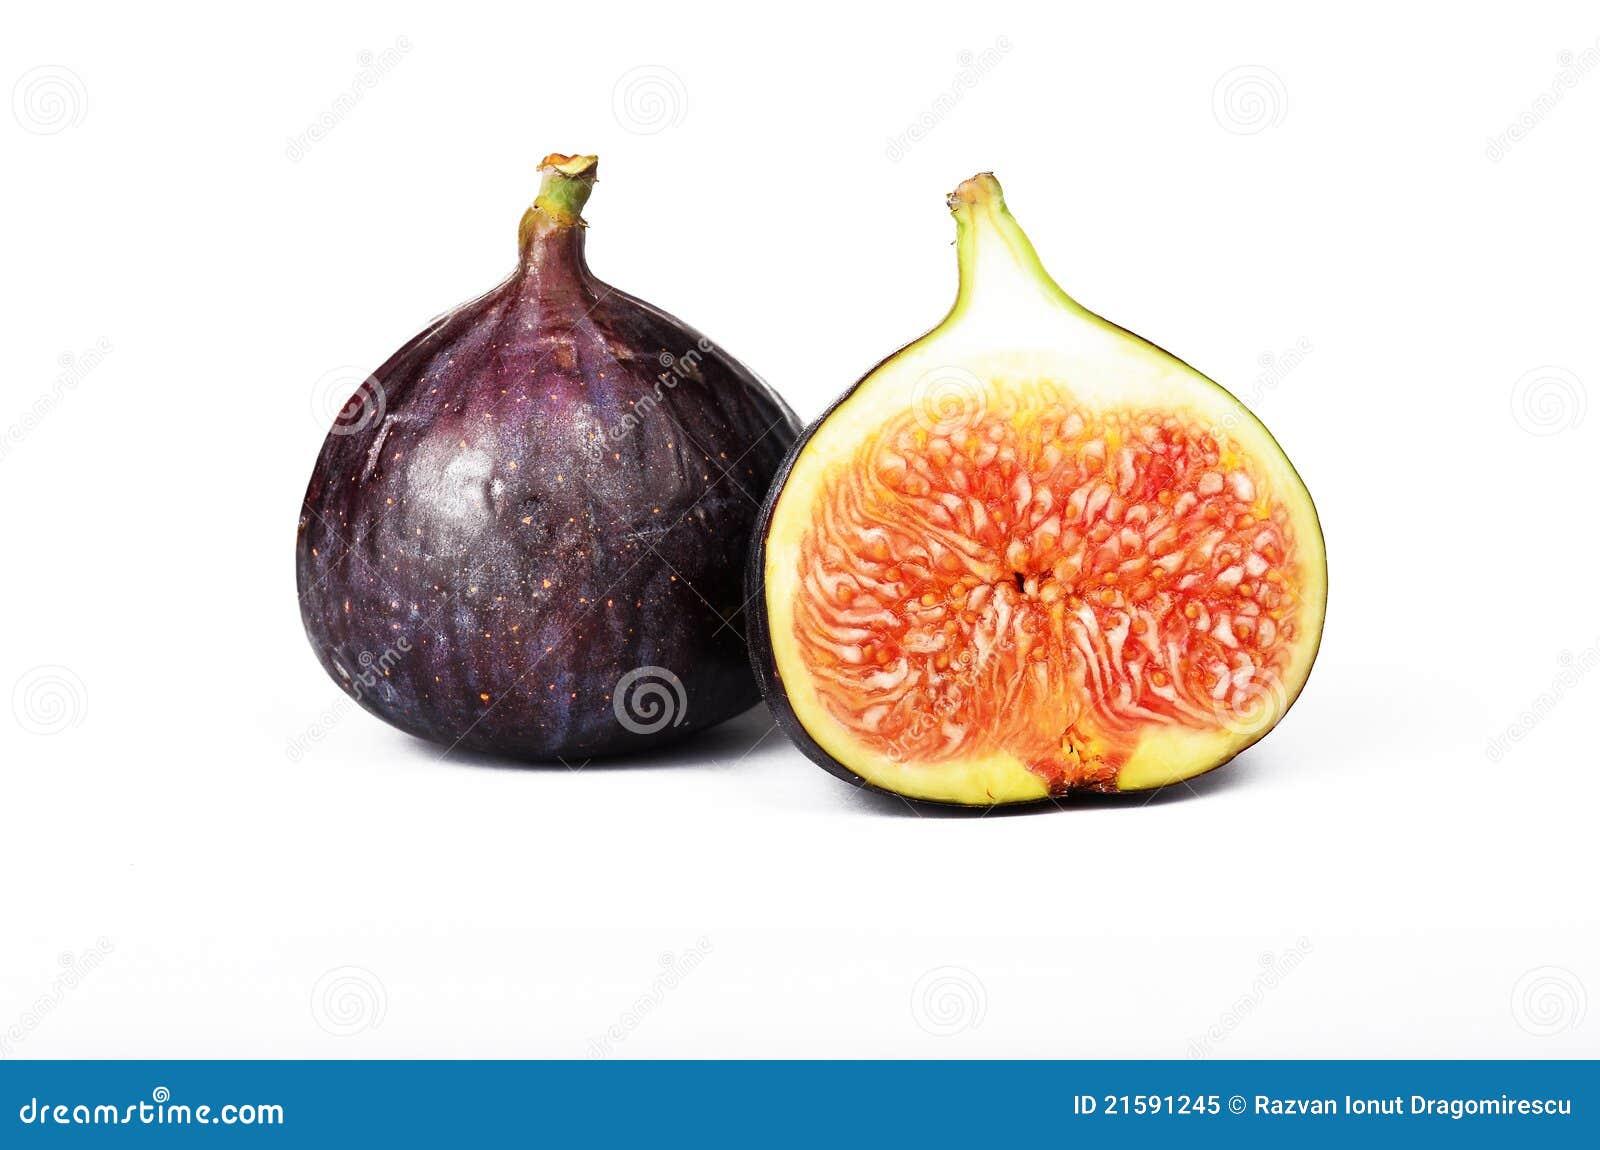 Drawing human ear royalty free stock photography image 25570937 - Fig Fruit Royalty Free Stock Photo